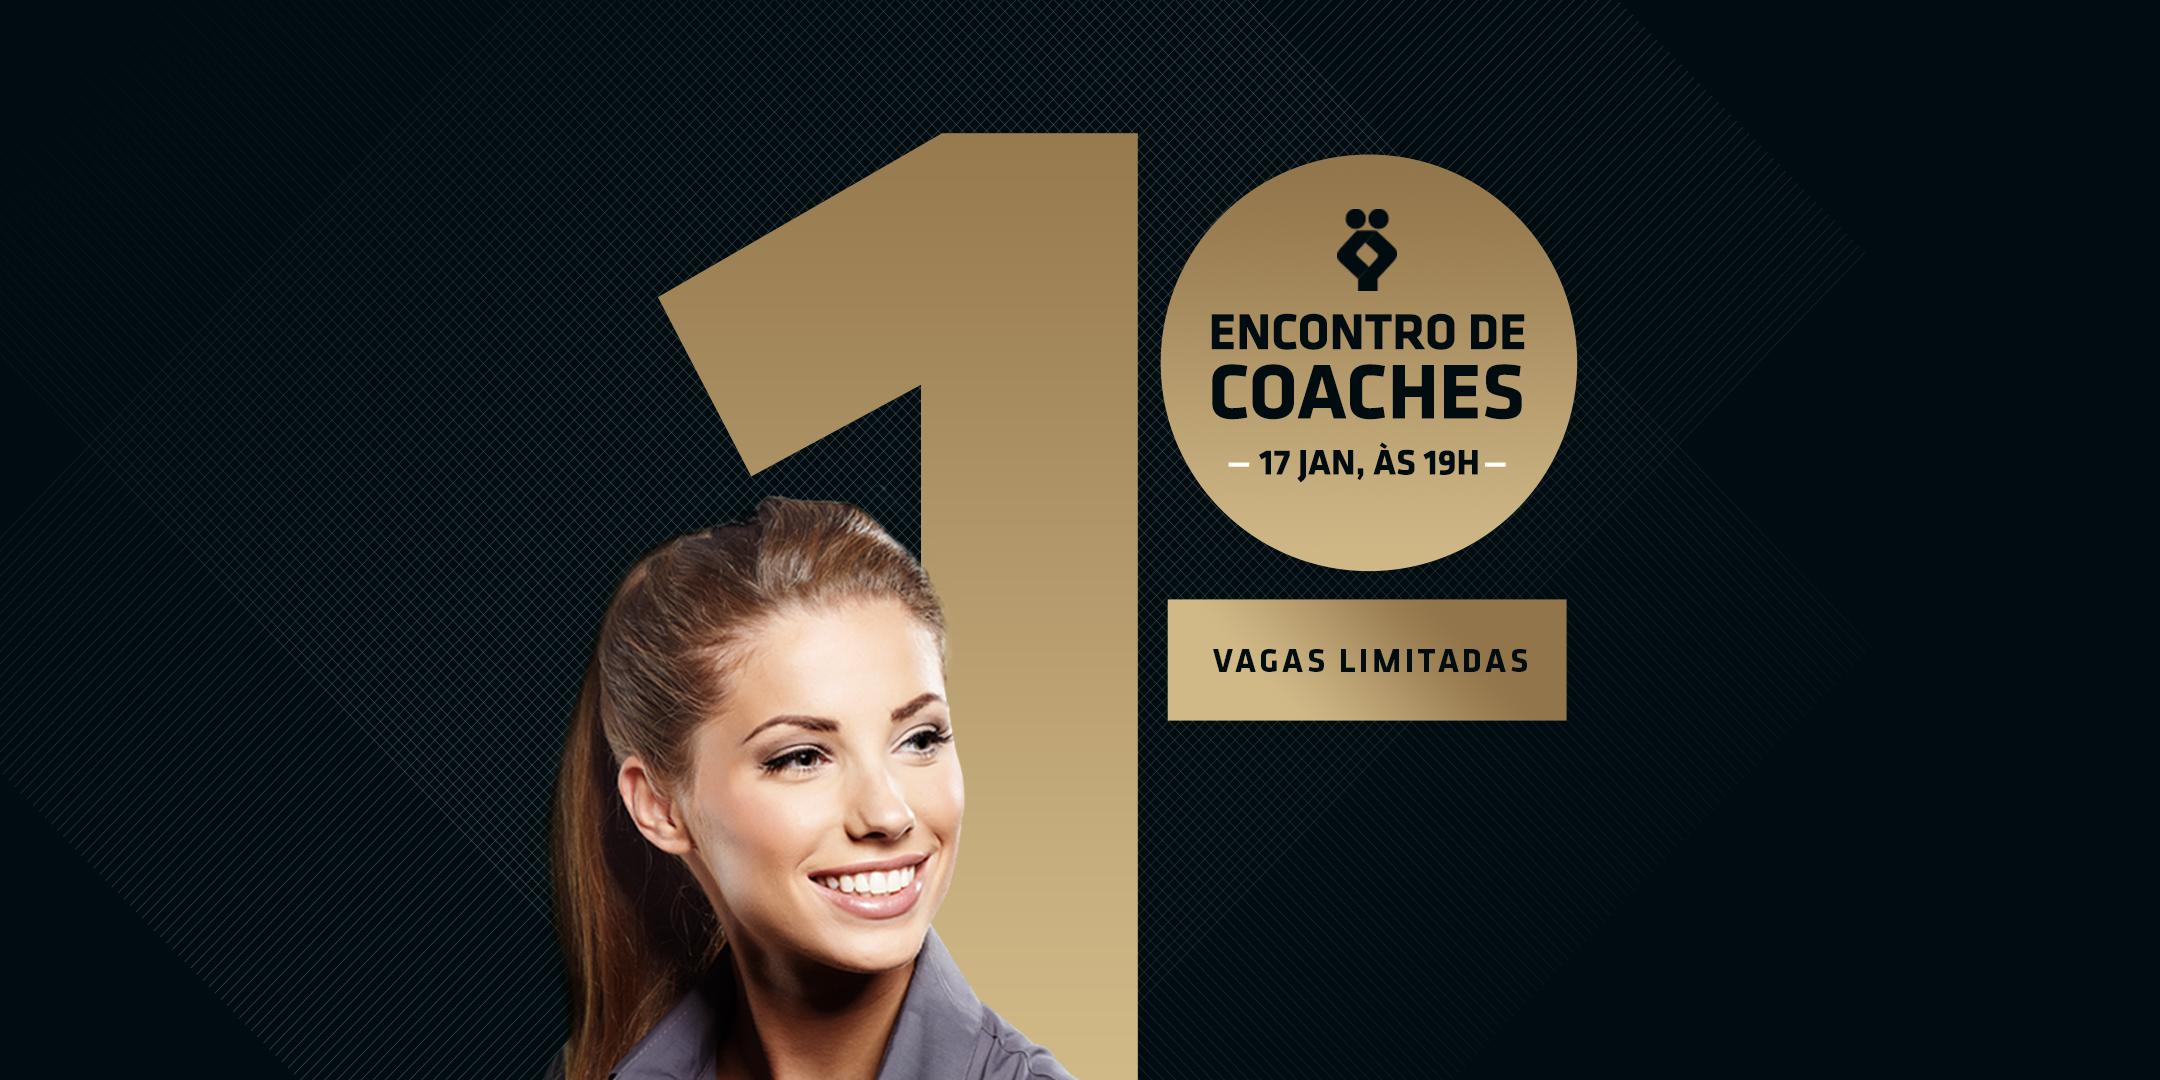 [Fortaleza] I Encontro de Coaches Febracis